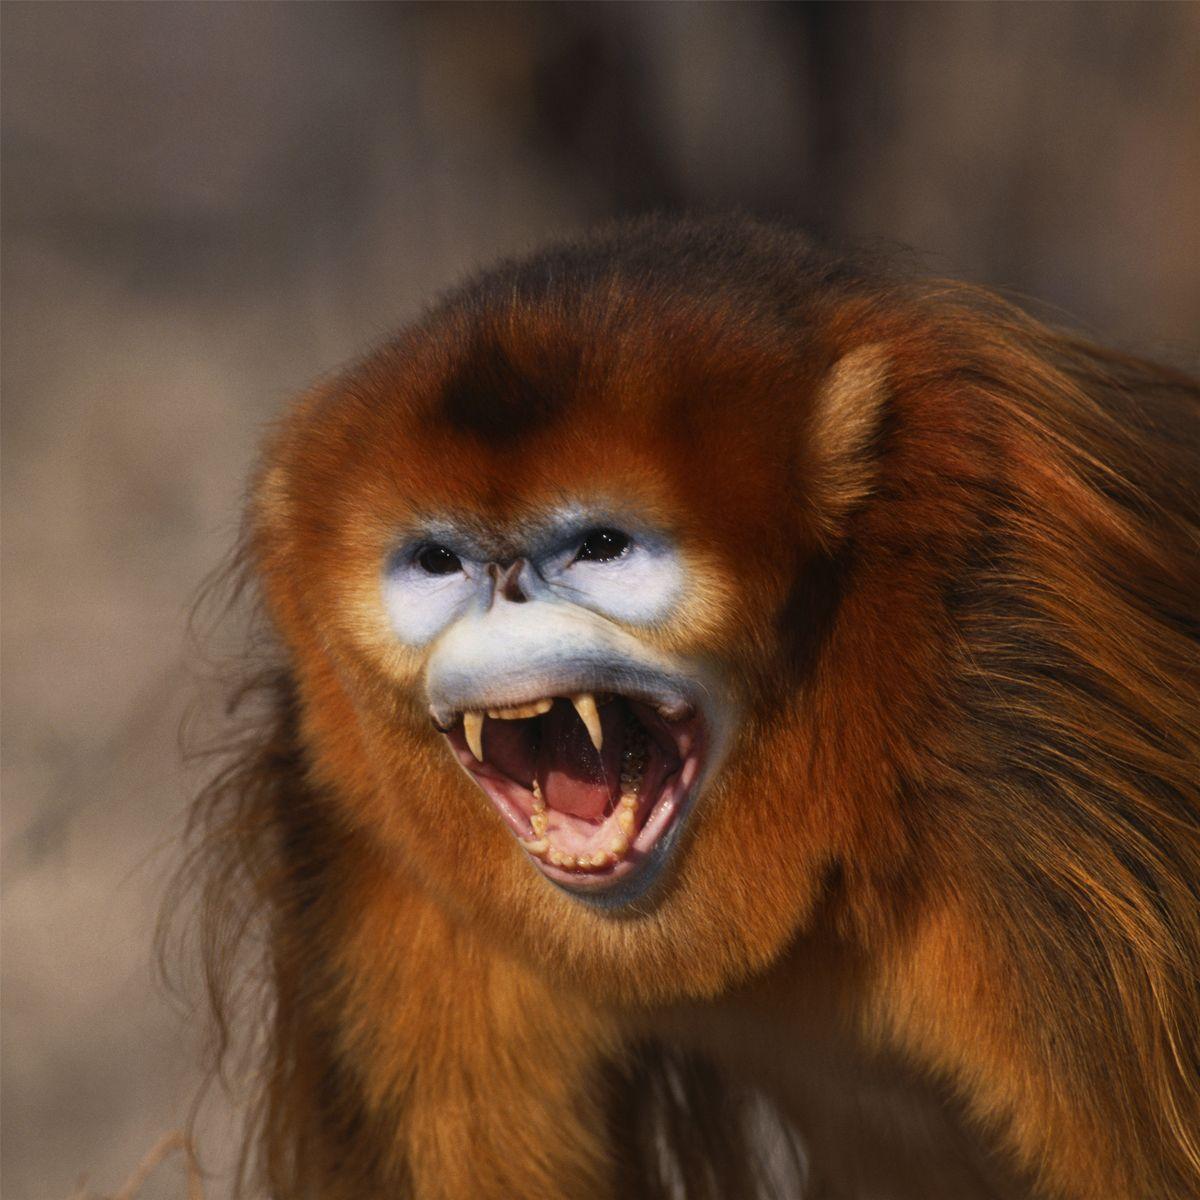 Golden Snub-Nosed Monkey (Rhinopithecus roxellana) | about animals